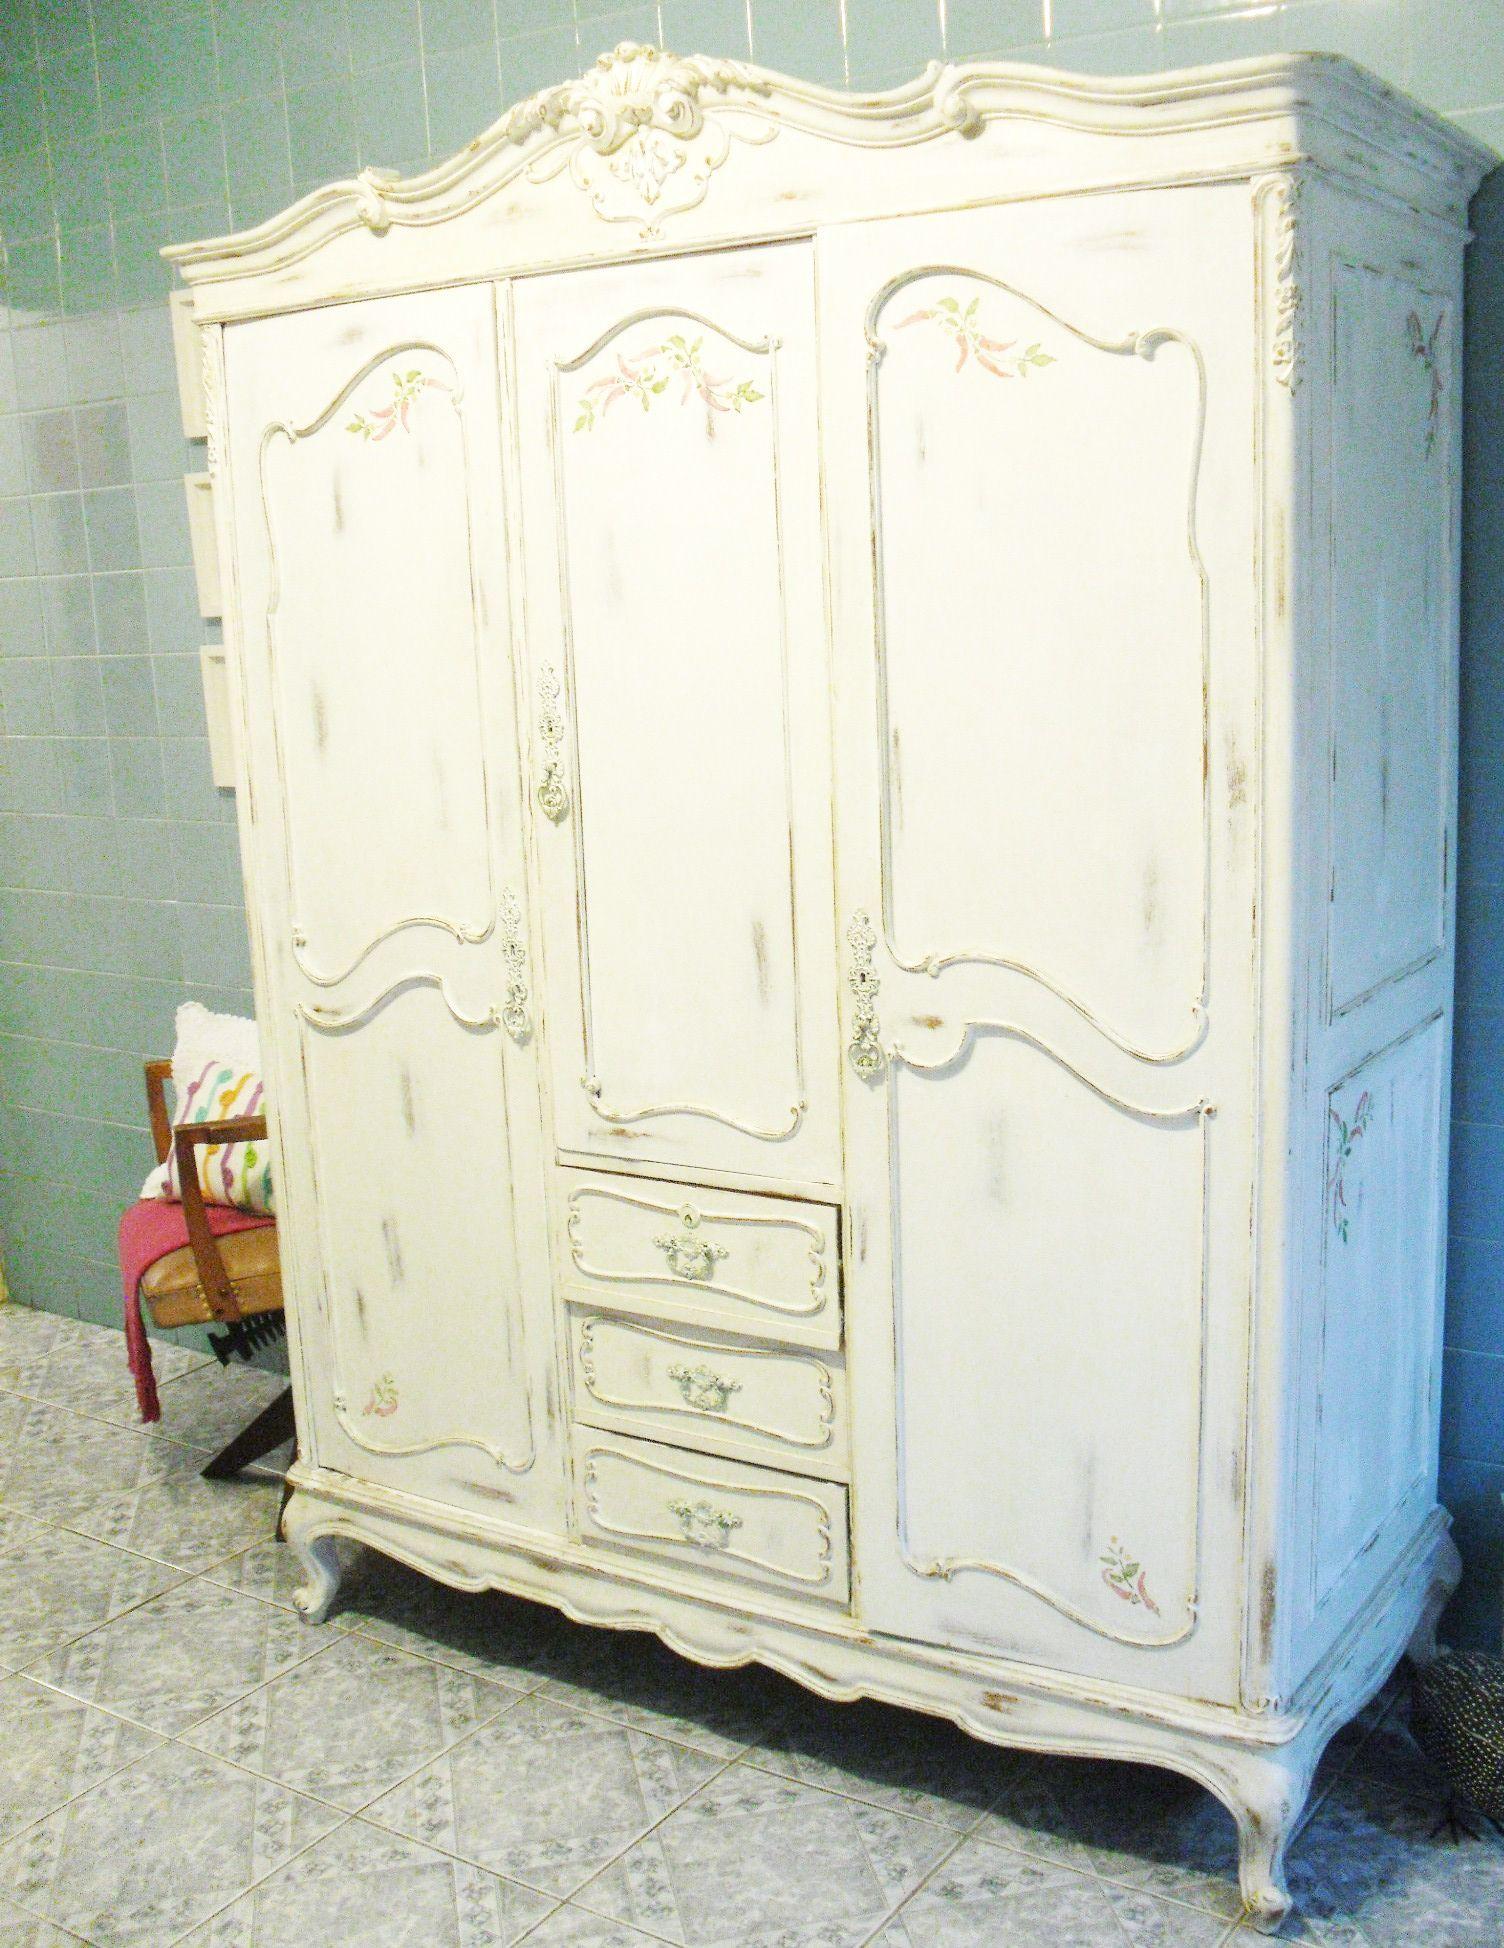 guarda-roupa,vintage,pátina,reforma de móveis,móveis antigos,stêncil ...